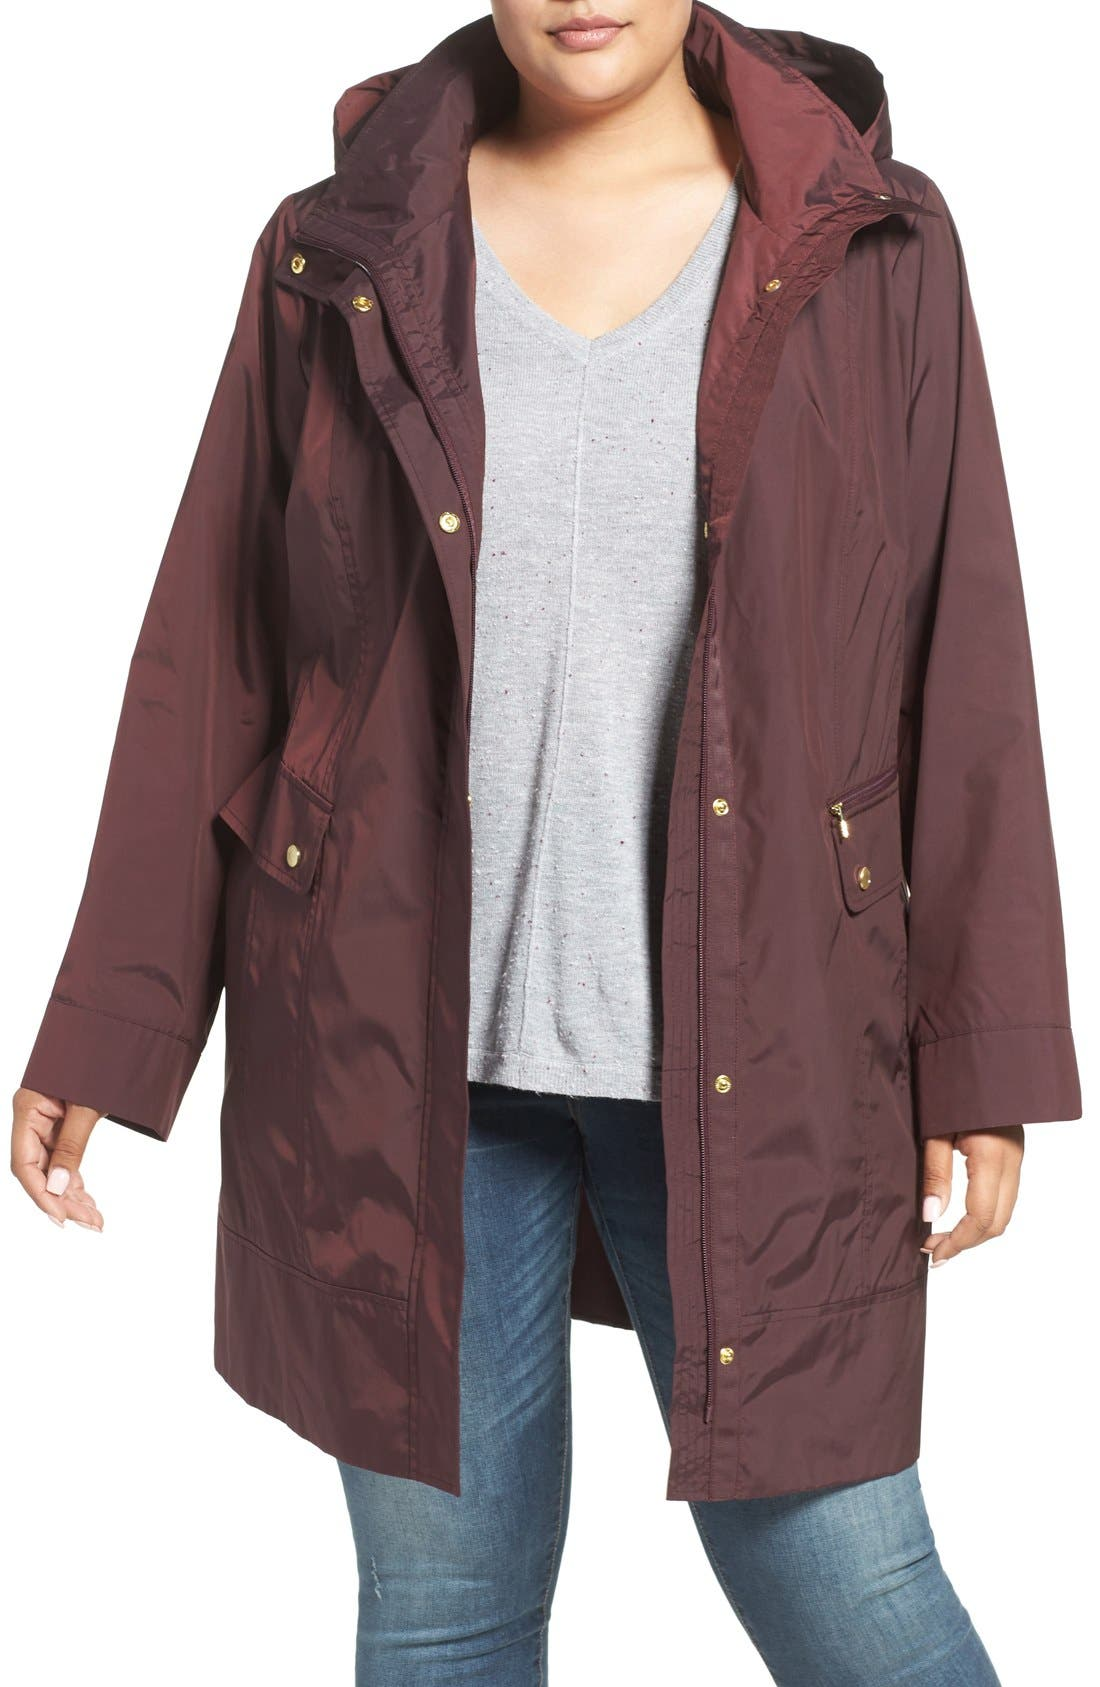 Cole Haan Water Resistant Rain Jacket,                         Main,                         color, Eggplant